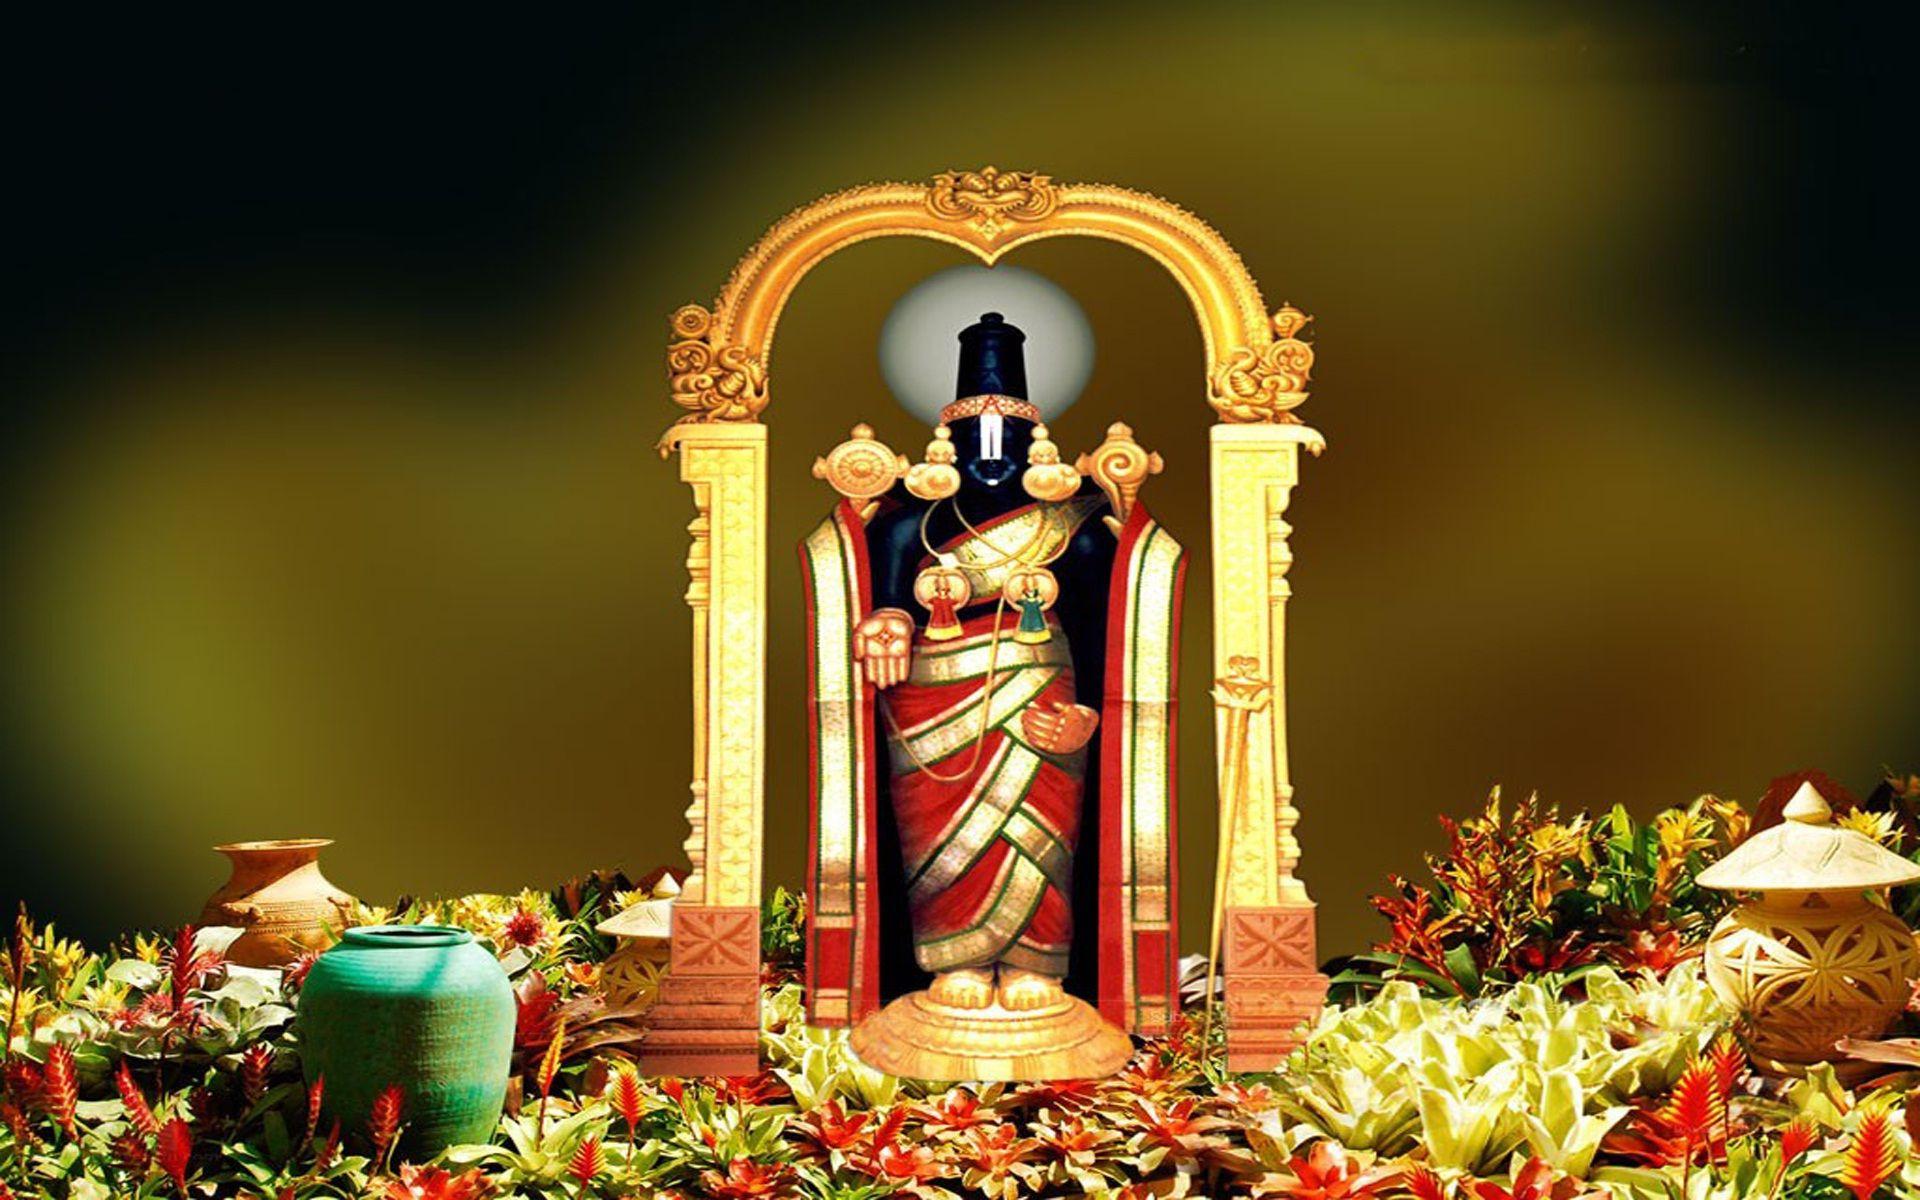 Wonderful Wallpaper Lord Perumal - 6e92e333a95e1bdb7b588034ab9426c4  Photograph_458630.jpg